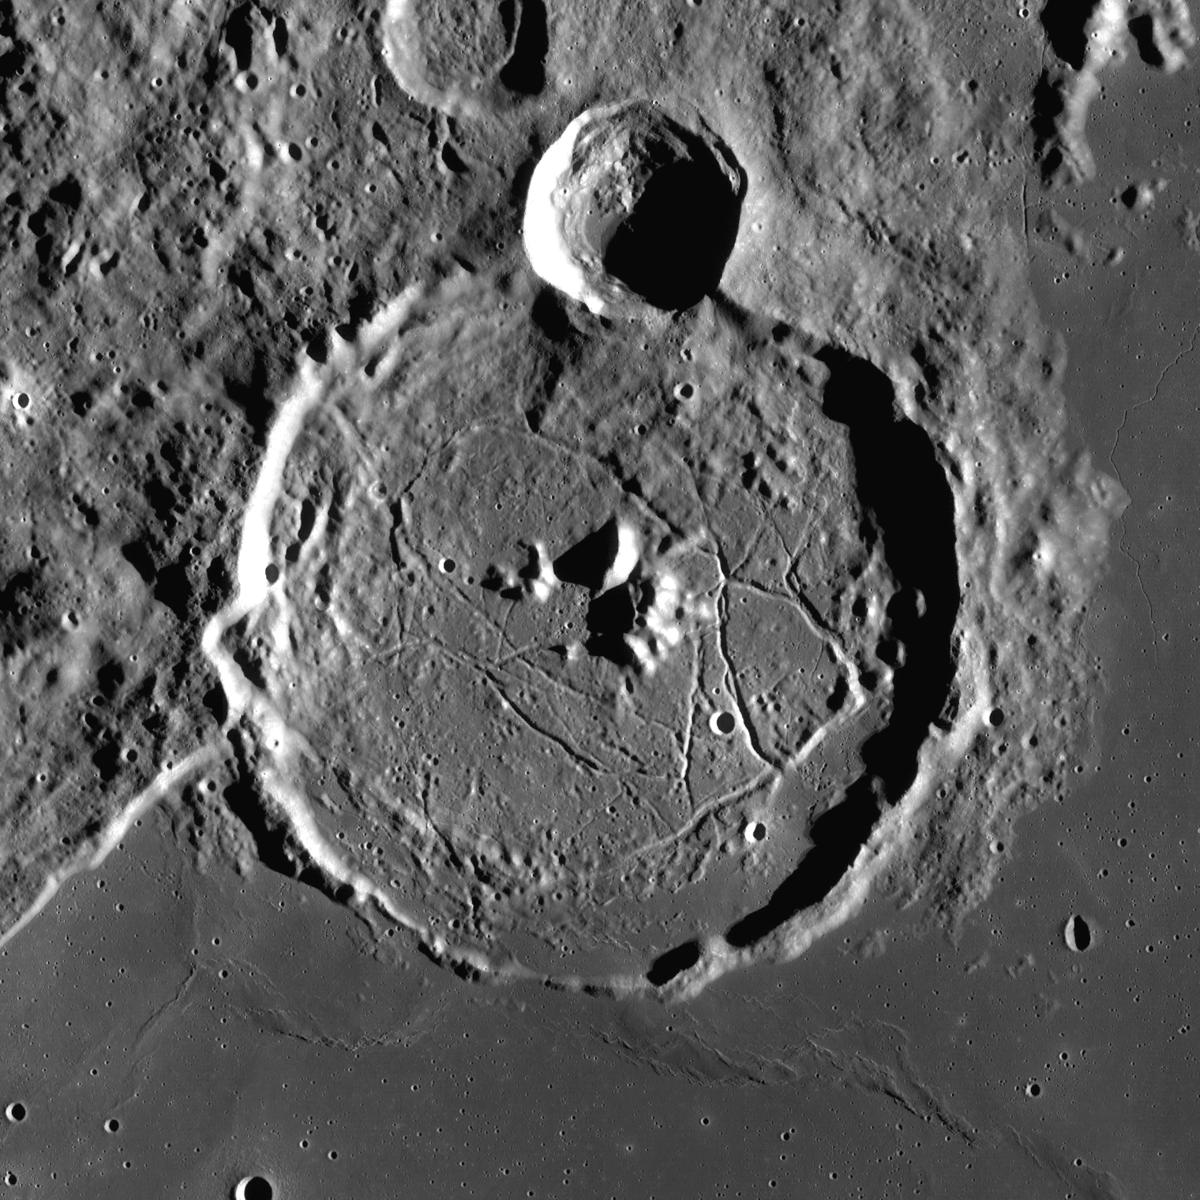 jc4 moon base location - photo #41